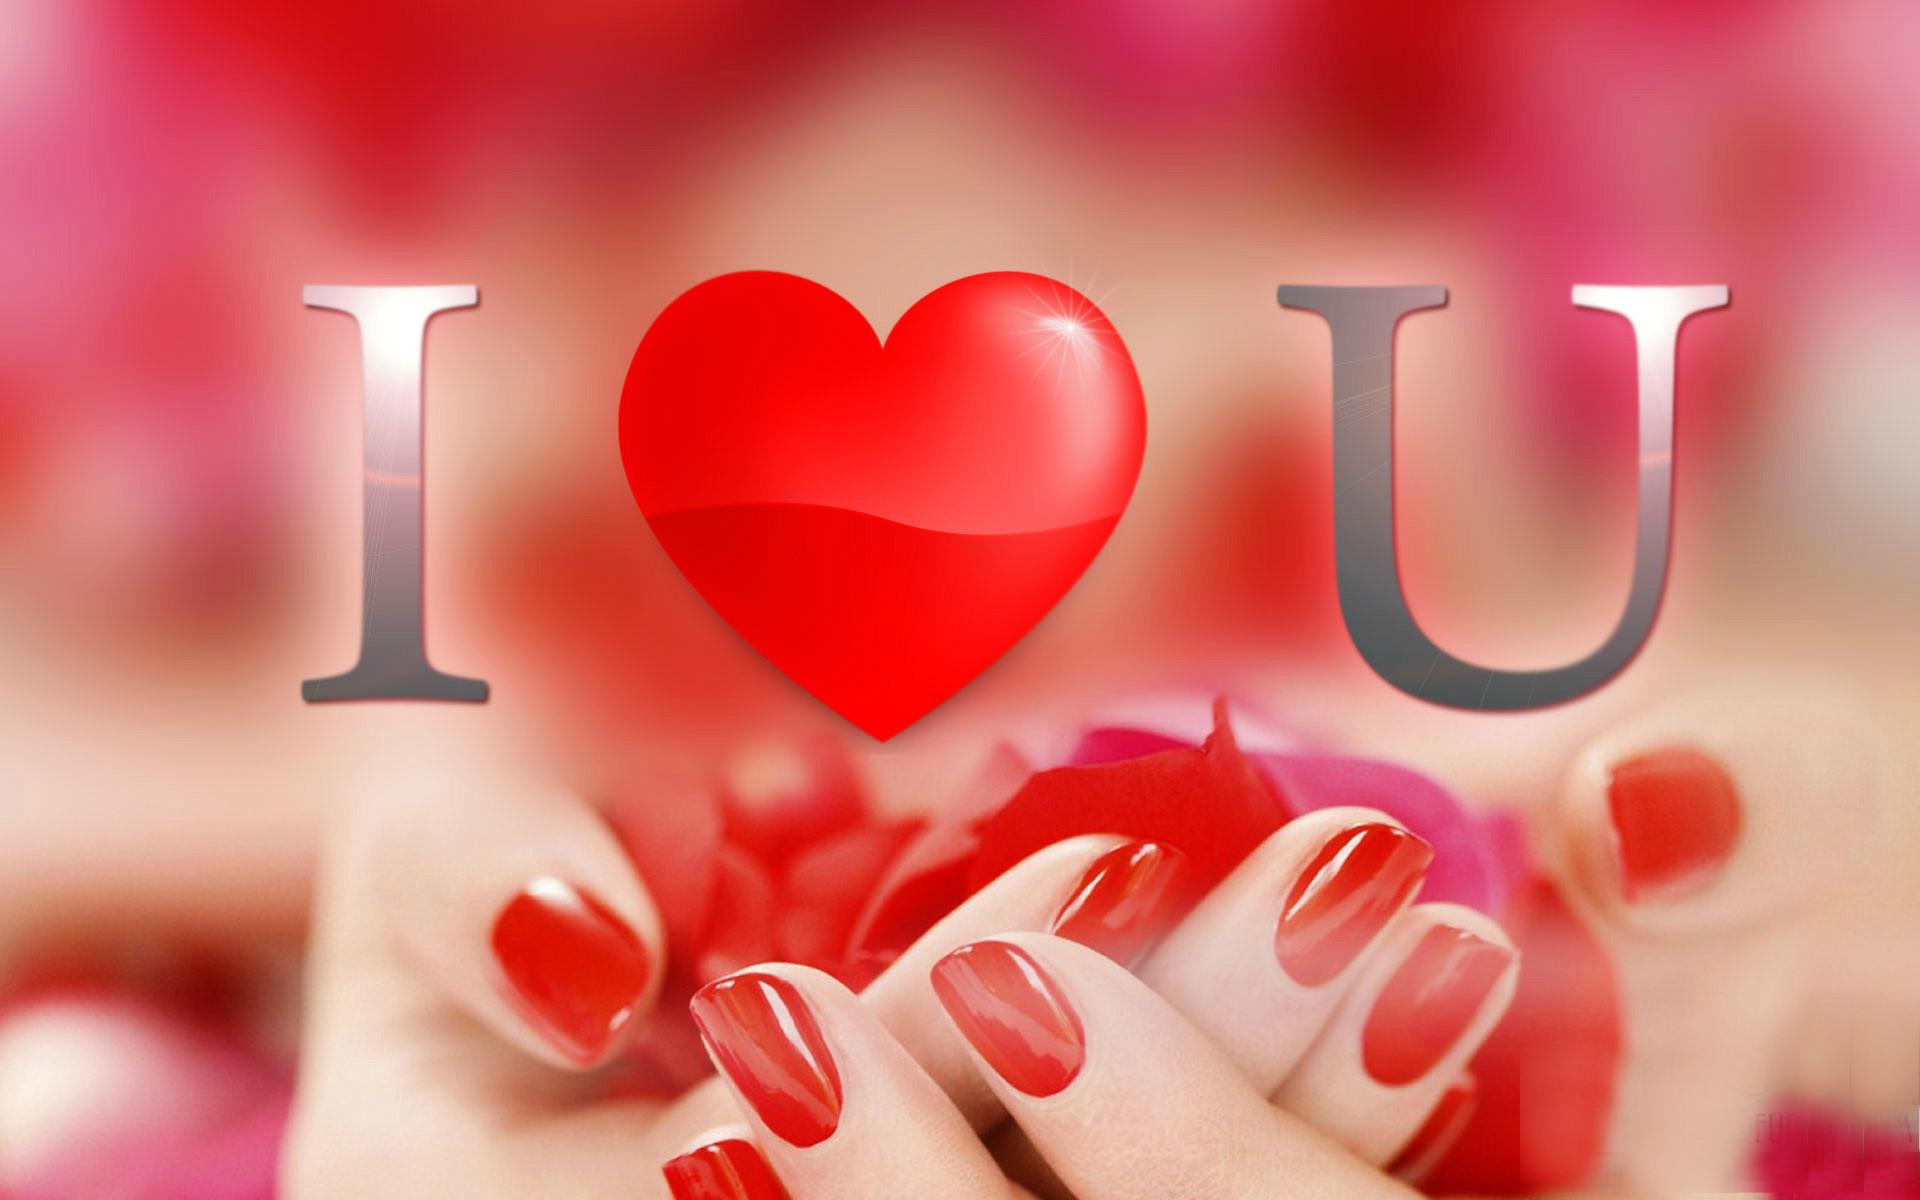 Wallpaper of love heart - J love wallpaper download ...